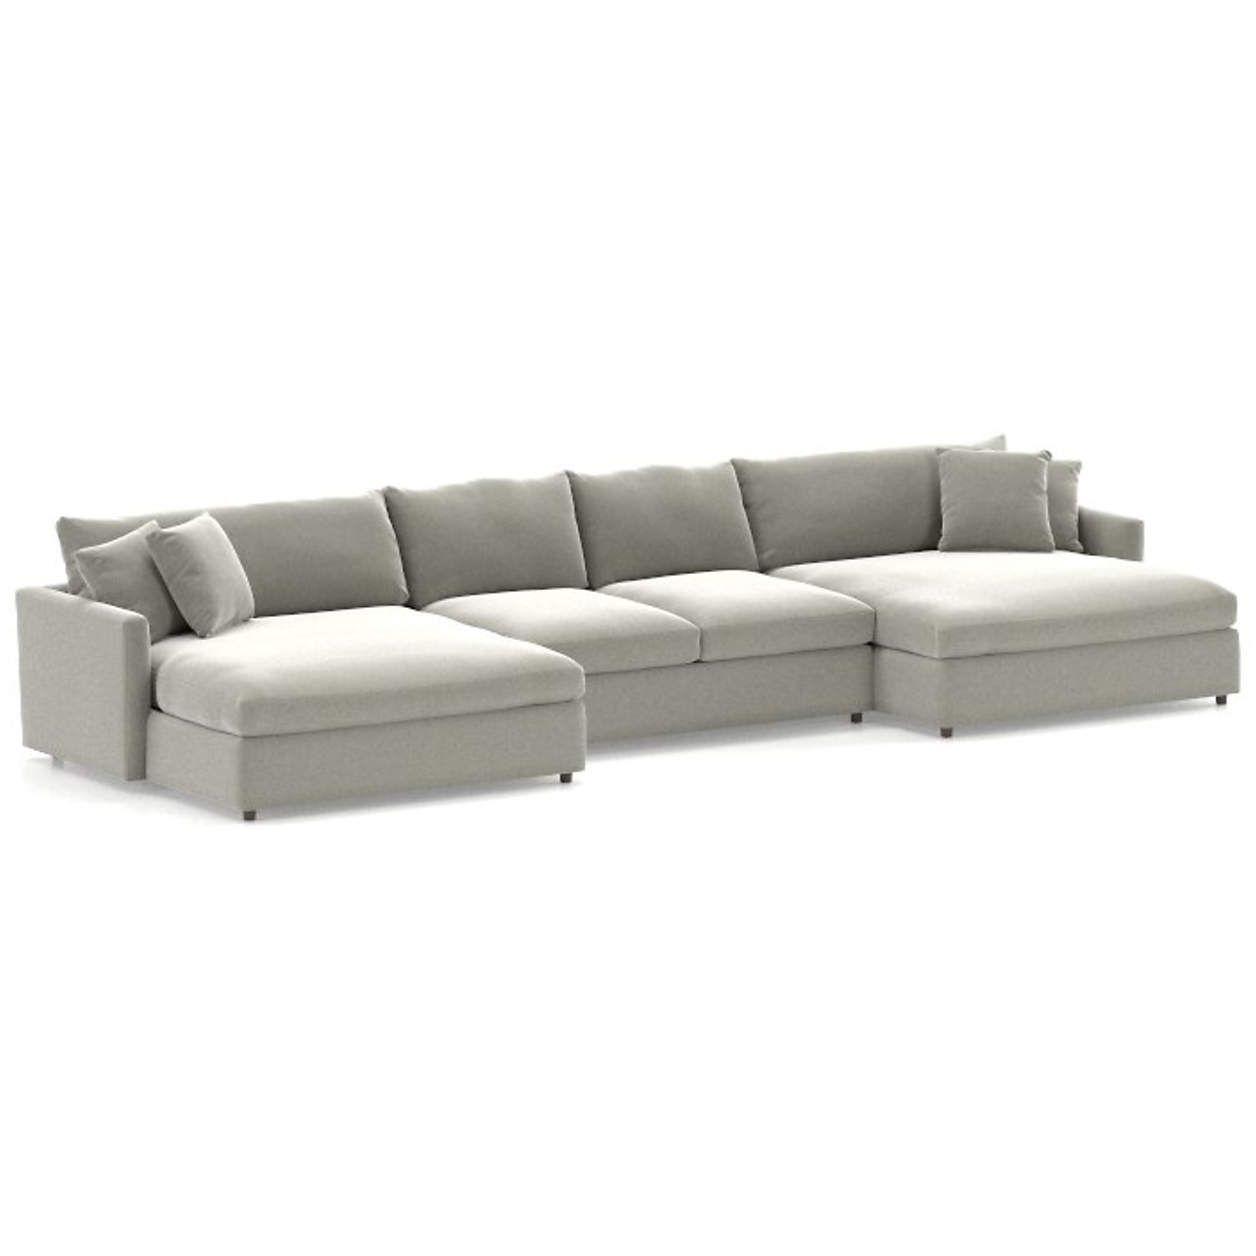 Lounge II 3-Piece Double Chaise Sectional Sofa